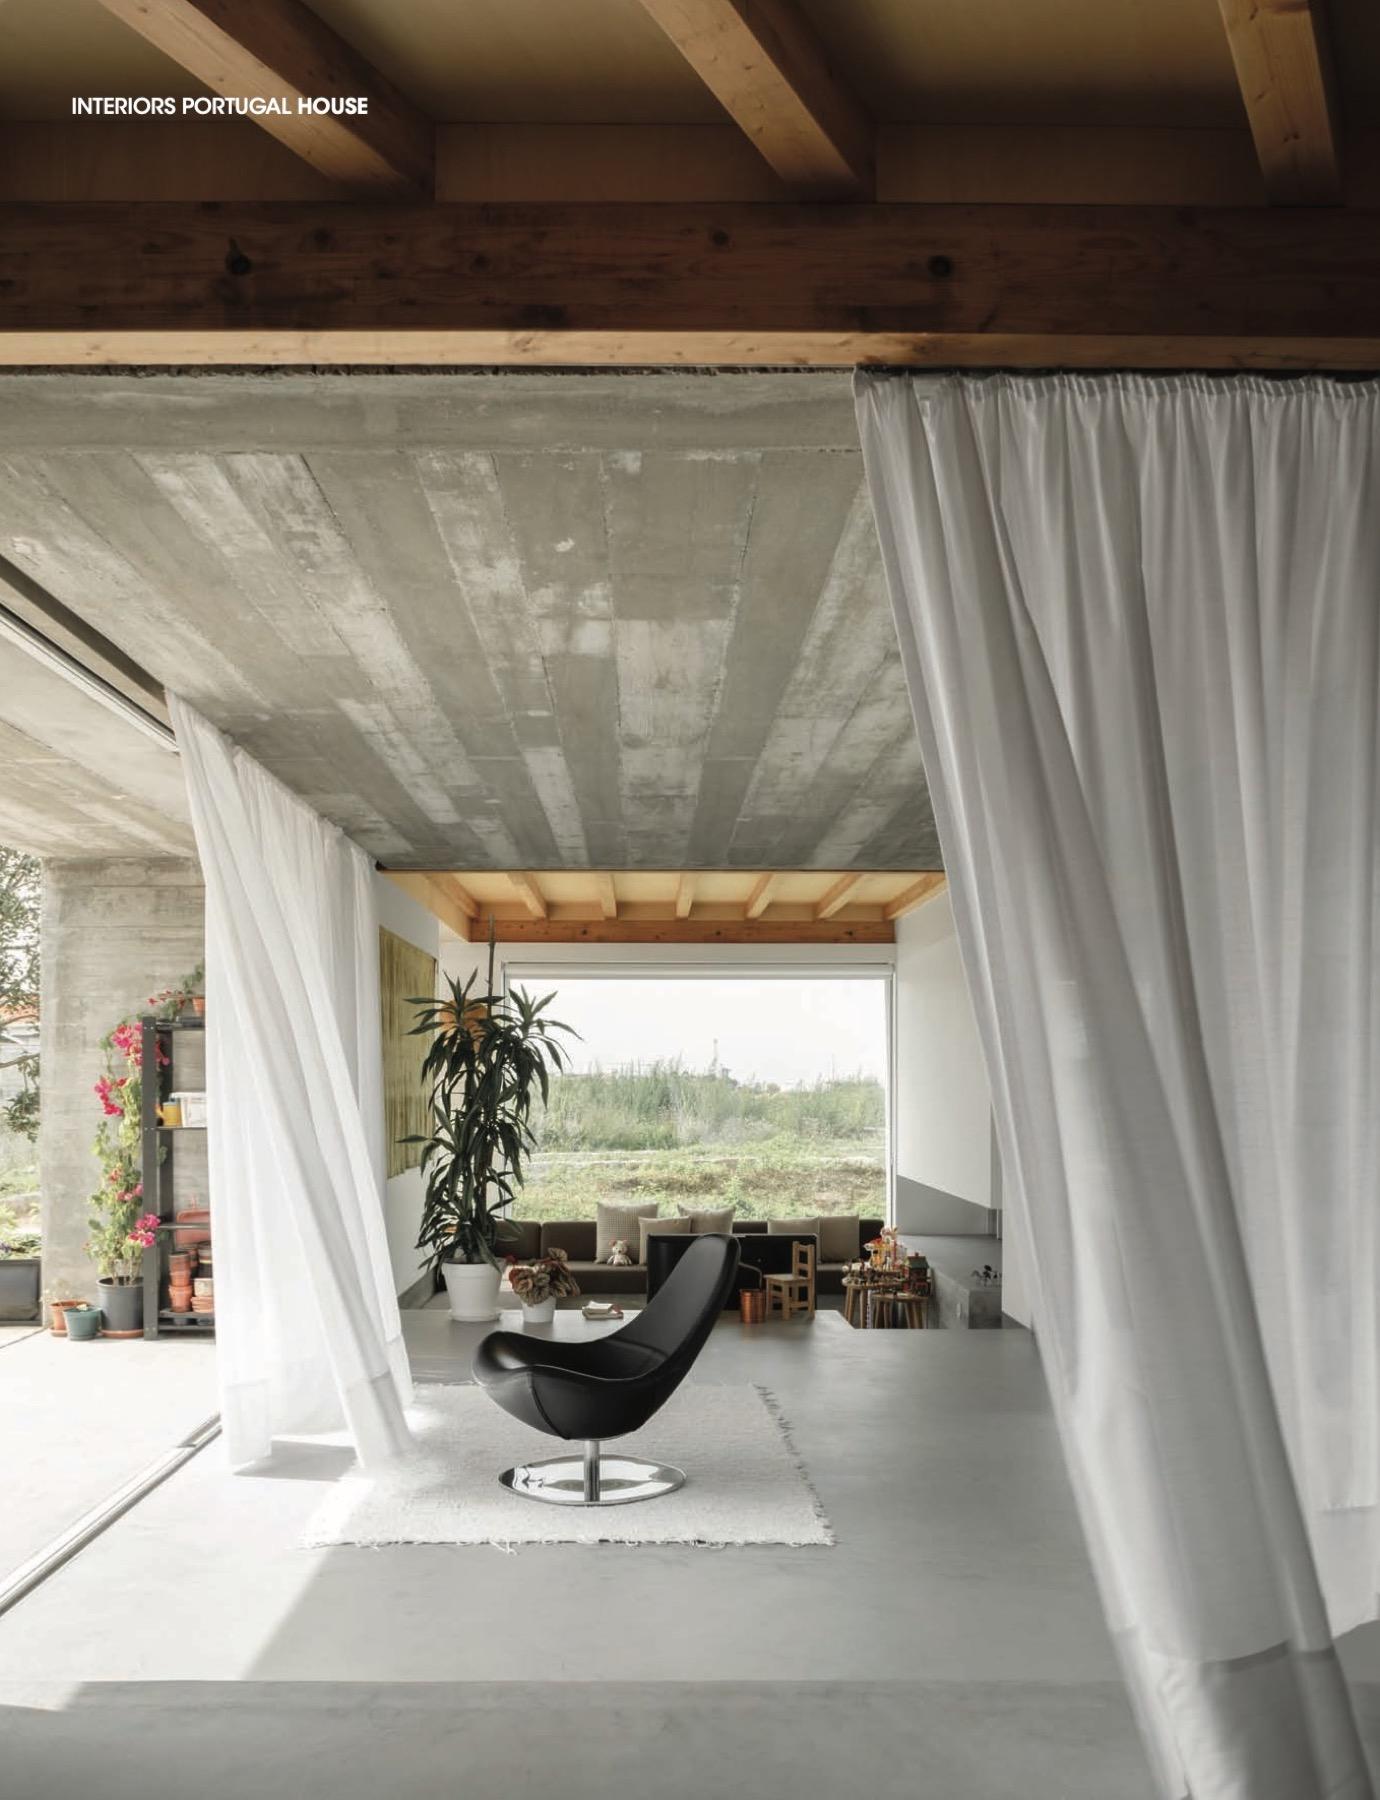 INTERIORS KOREA 414 casa rio paulo merlini ivo tavares studio 2